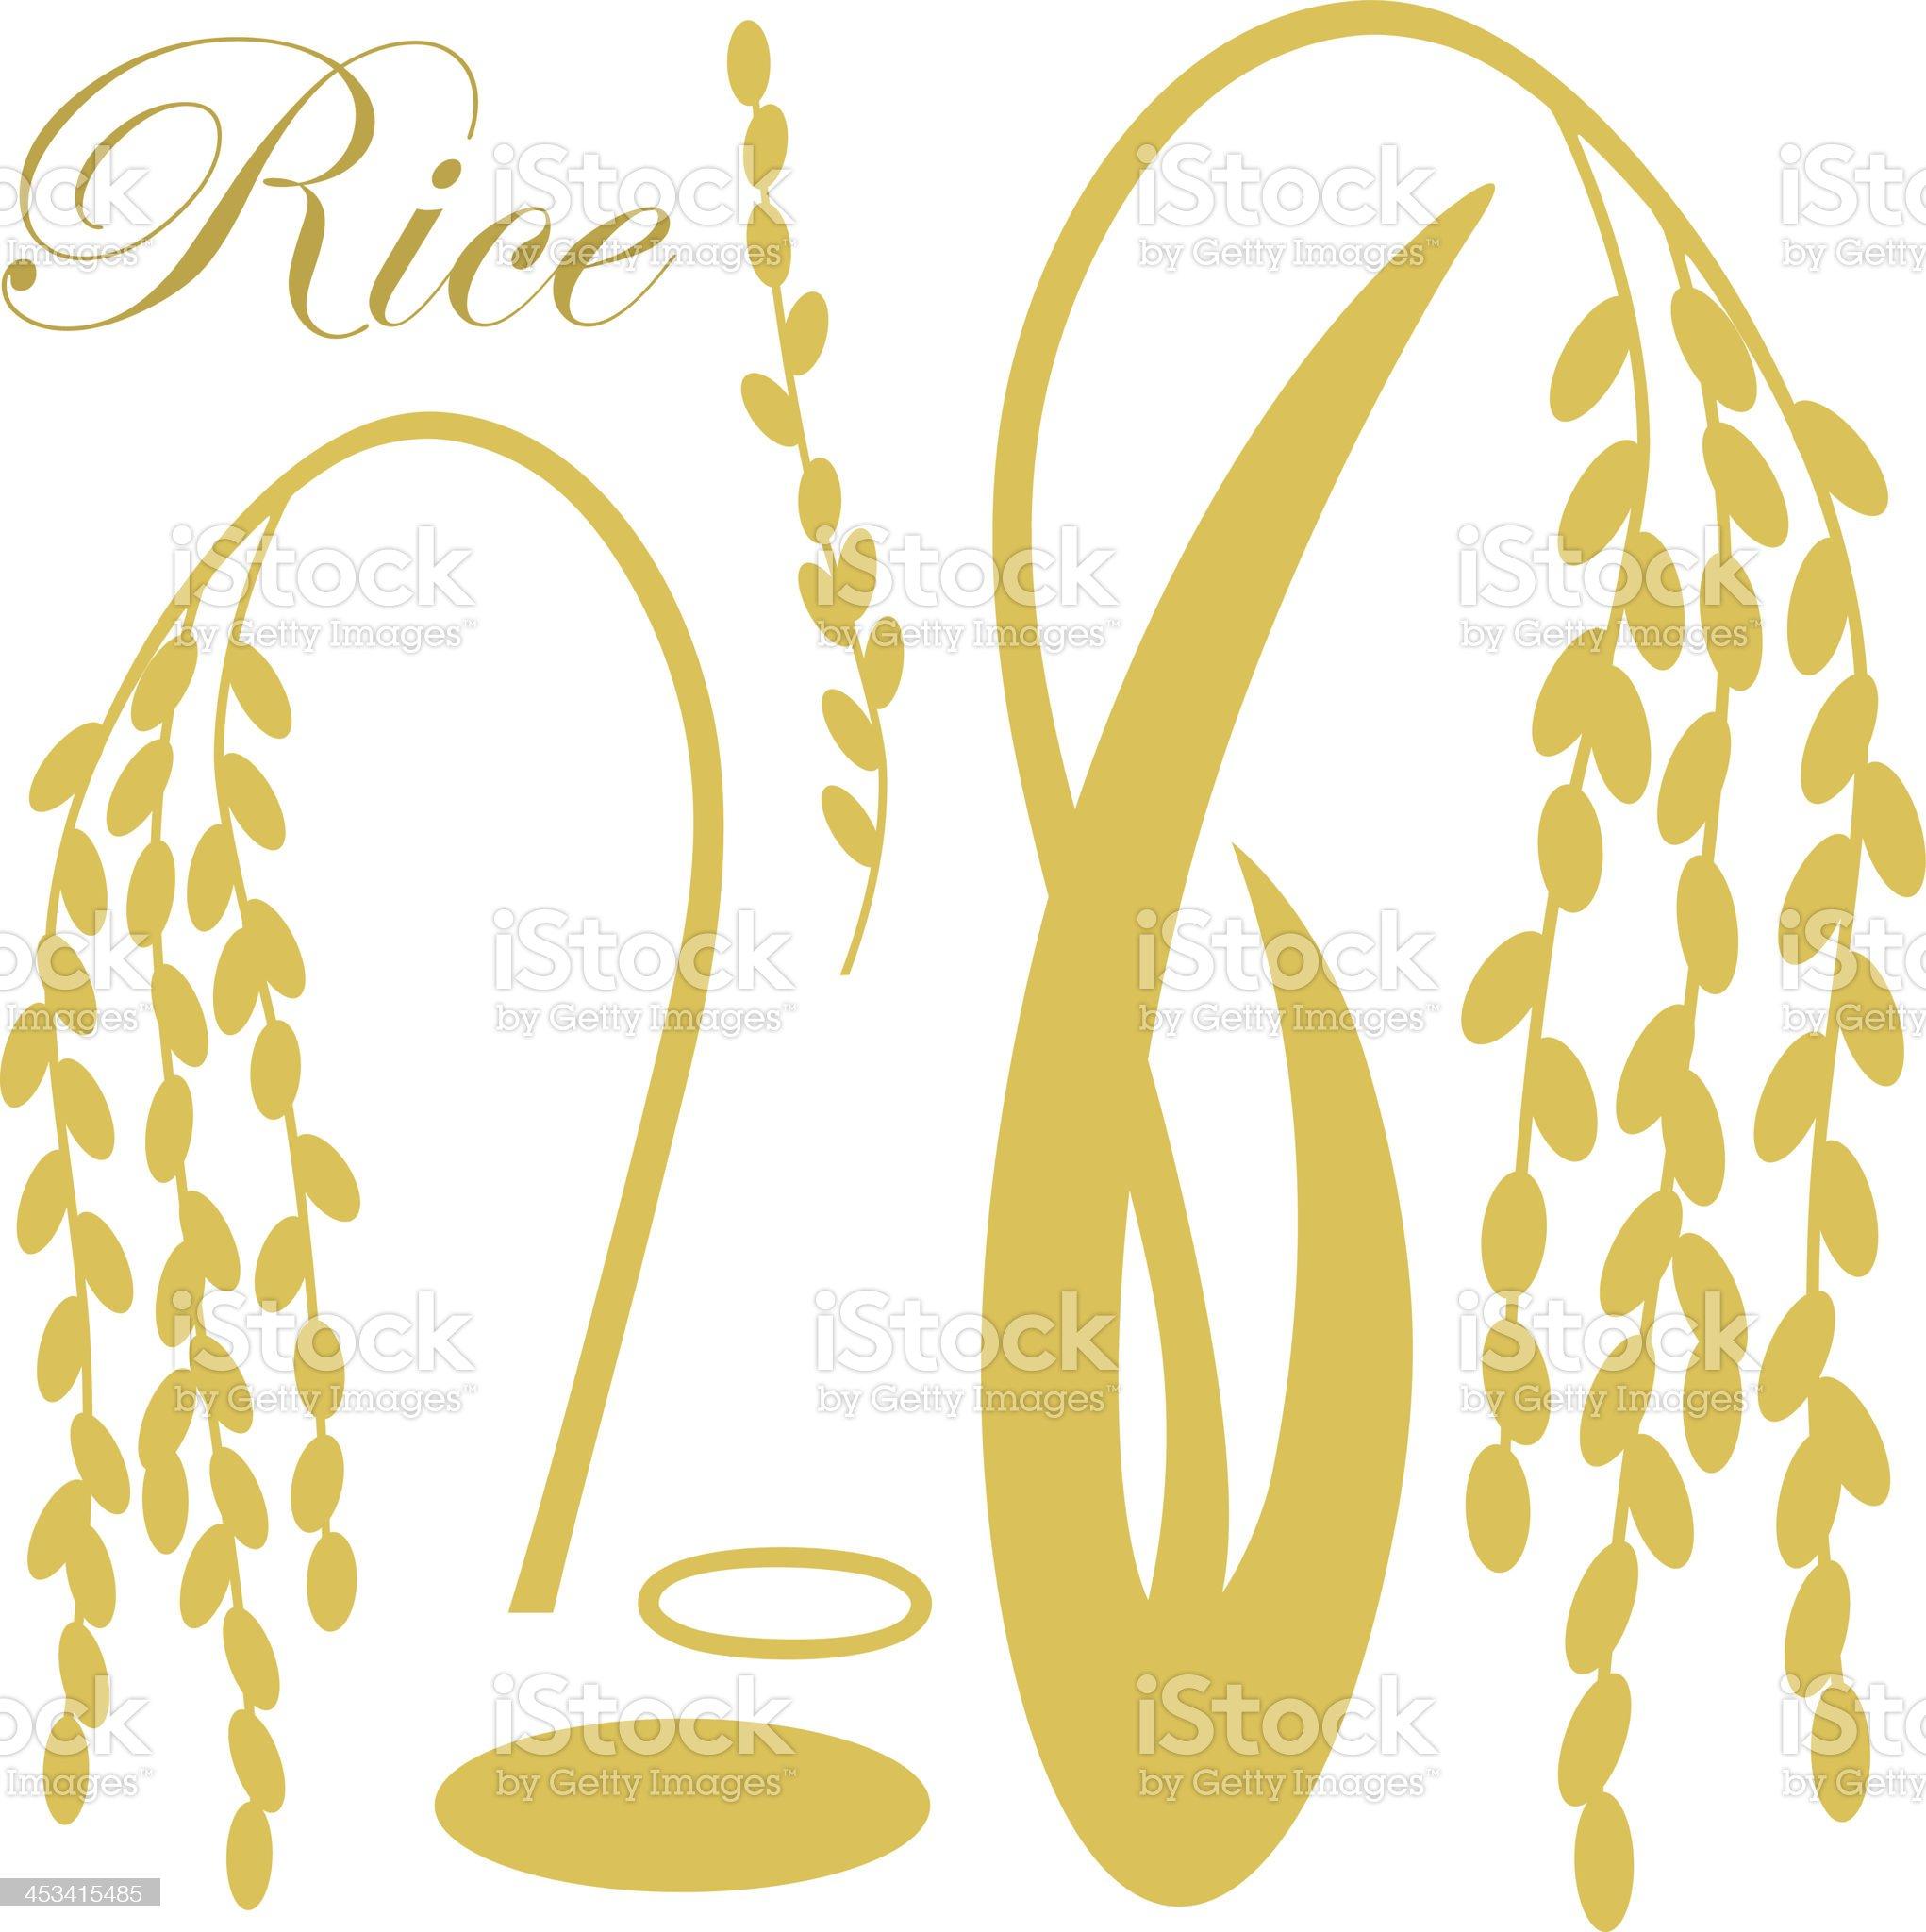 Rice royalty-free stock vector art